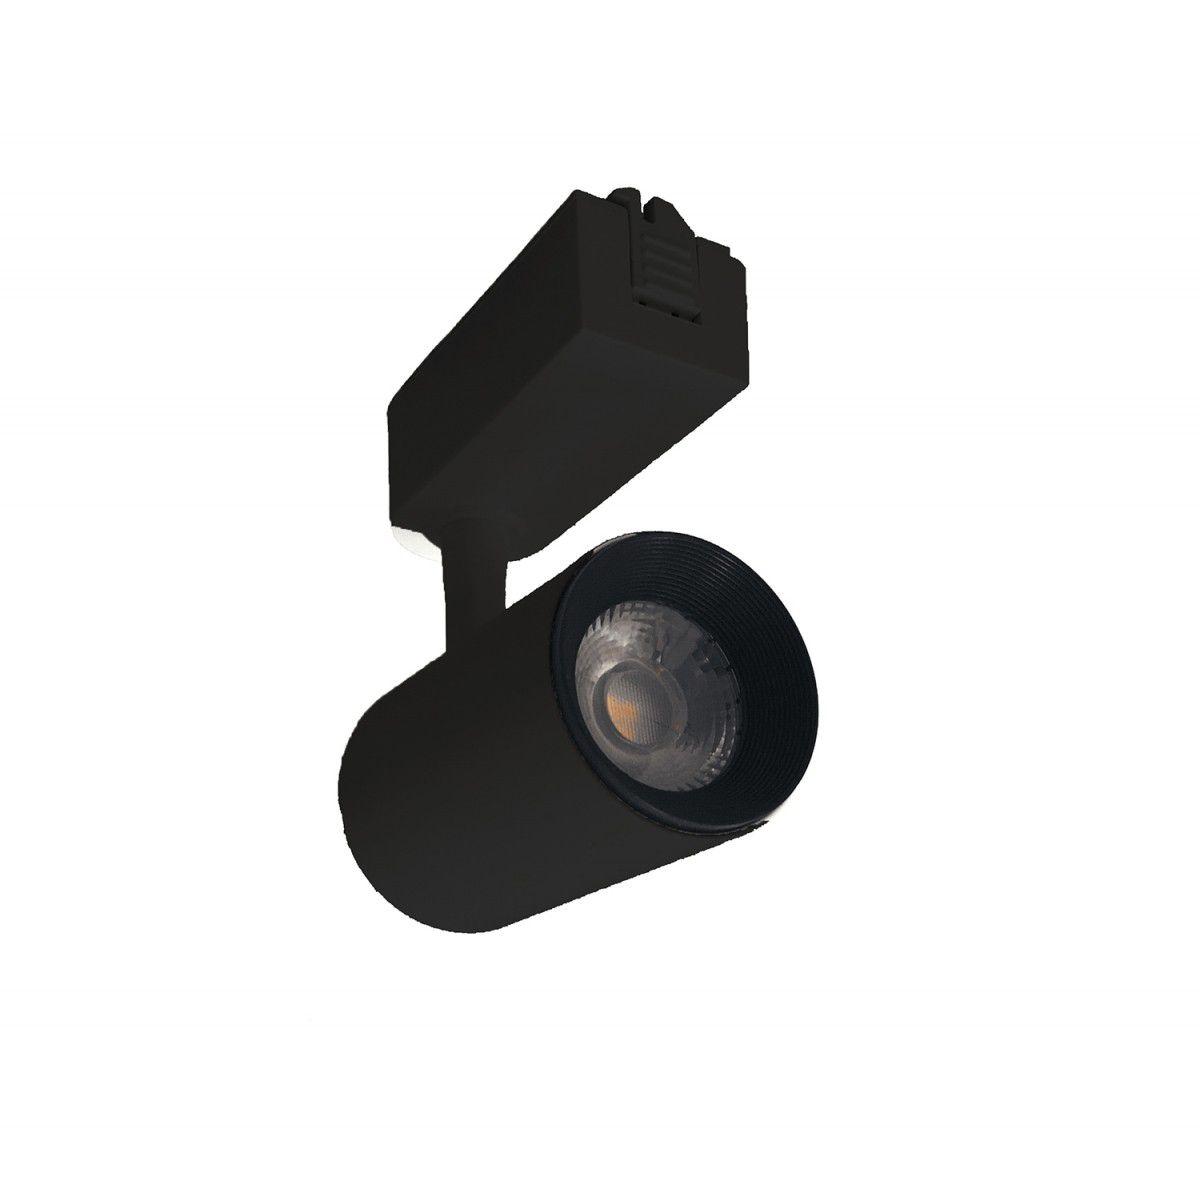 8x Spot Para Trilho Led 7W 6000K Preto Bivolt